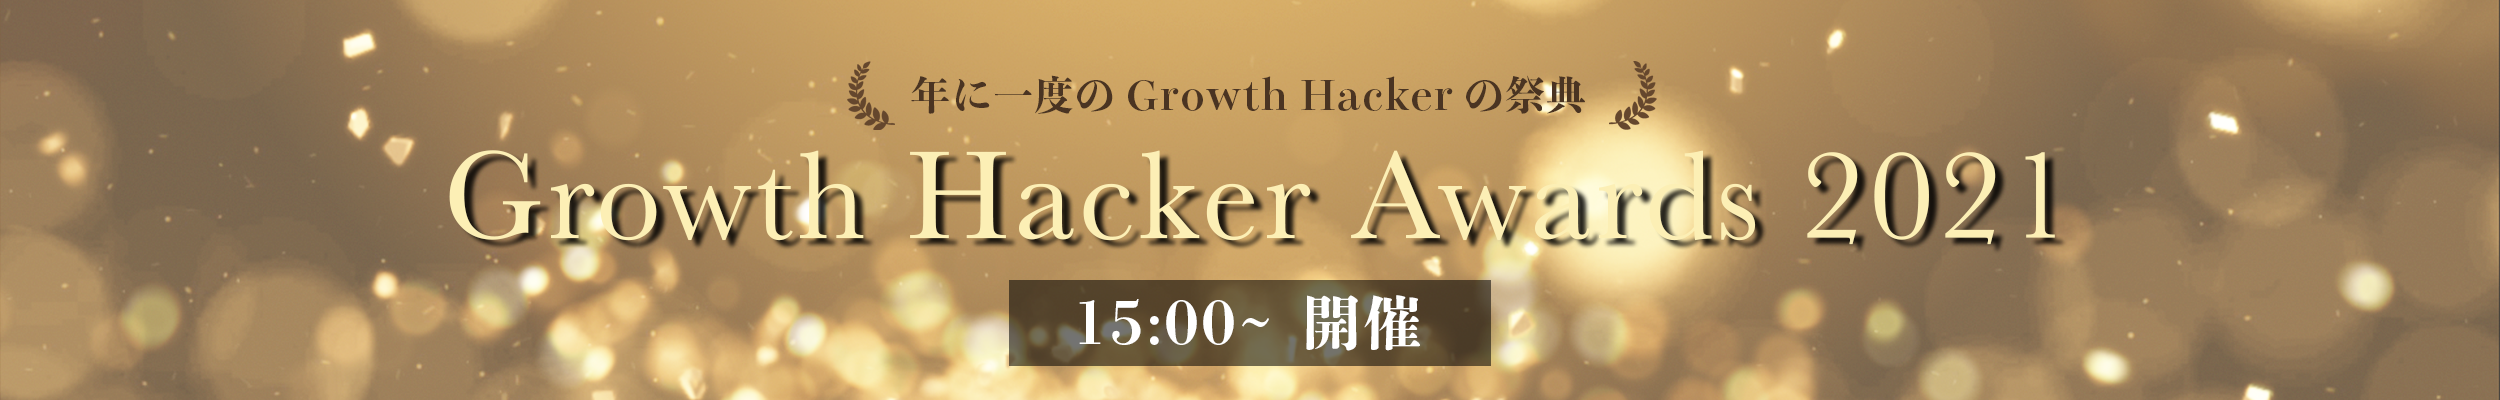 Growth Hacker Awards